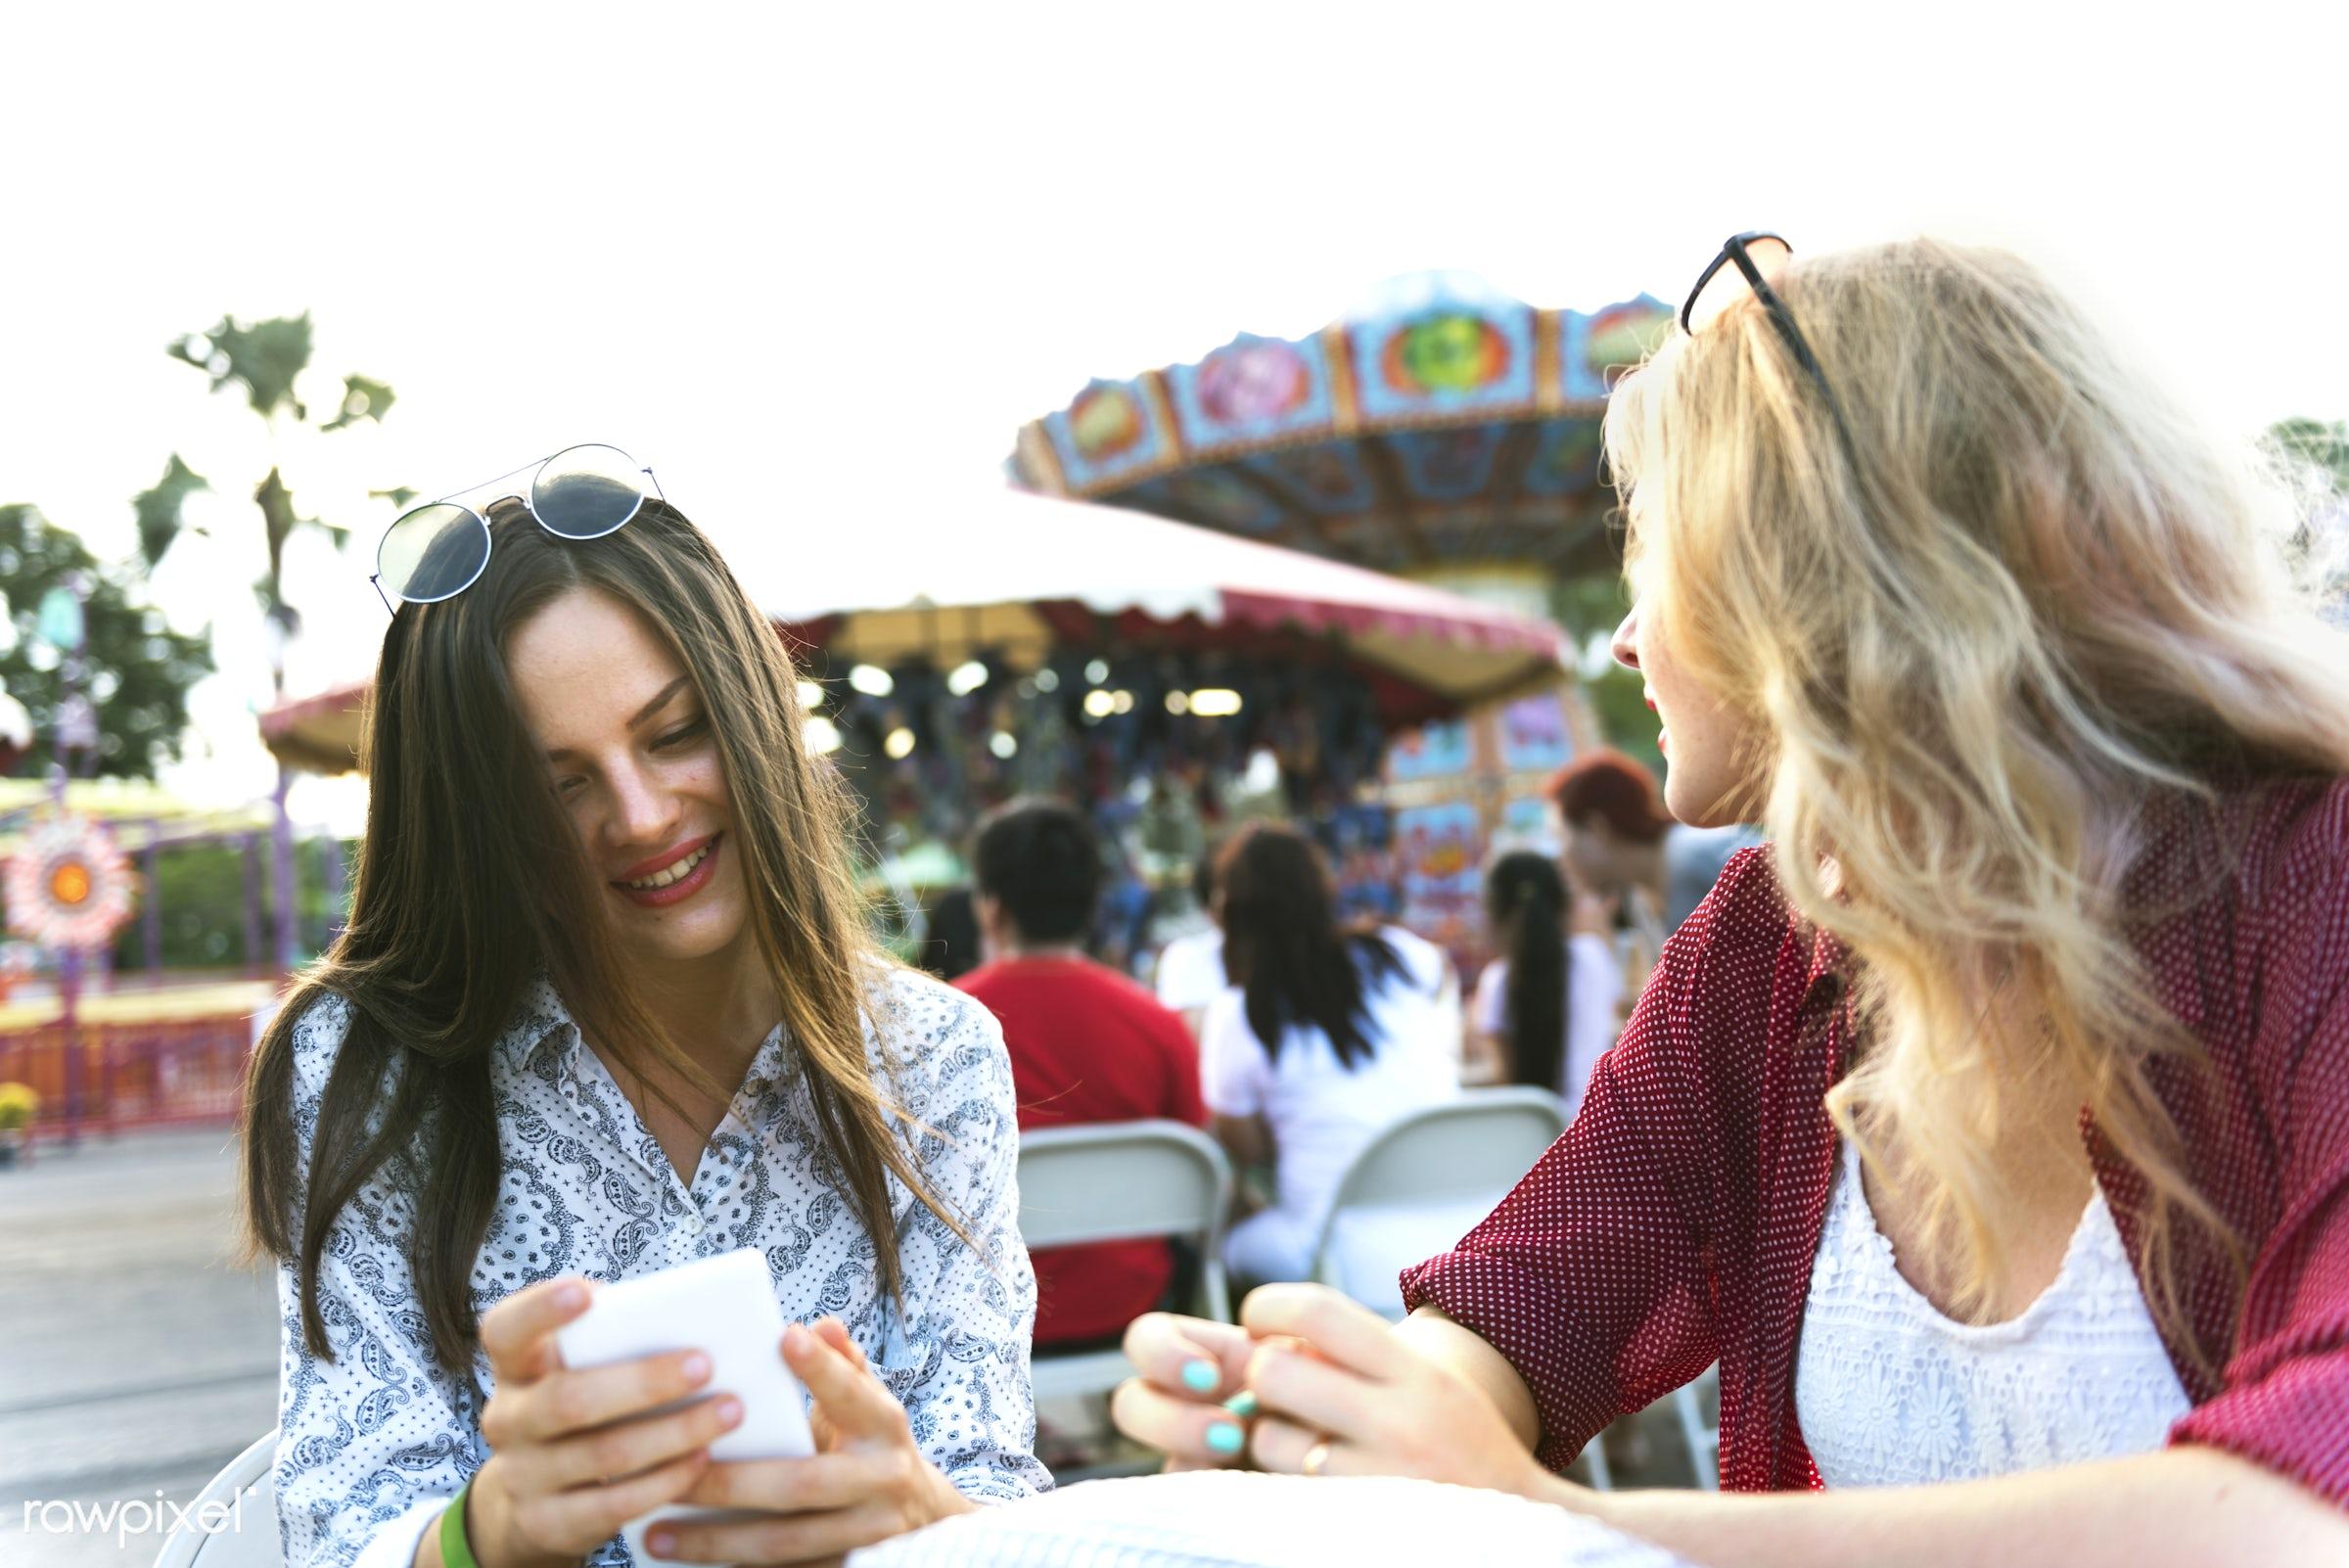 A group of friends is enjoying the amusement park - amusement park, cellphone, couple, dating, device, digital, enjoyment,...